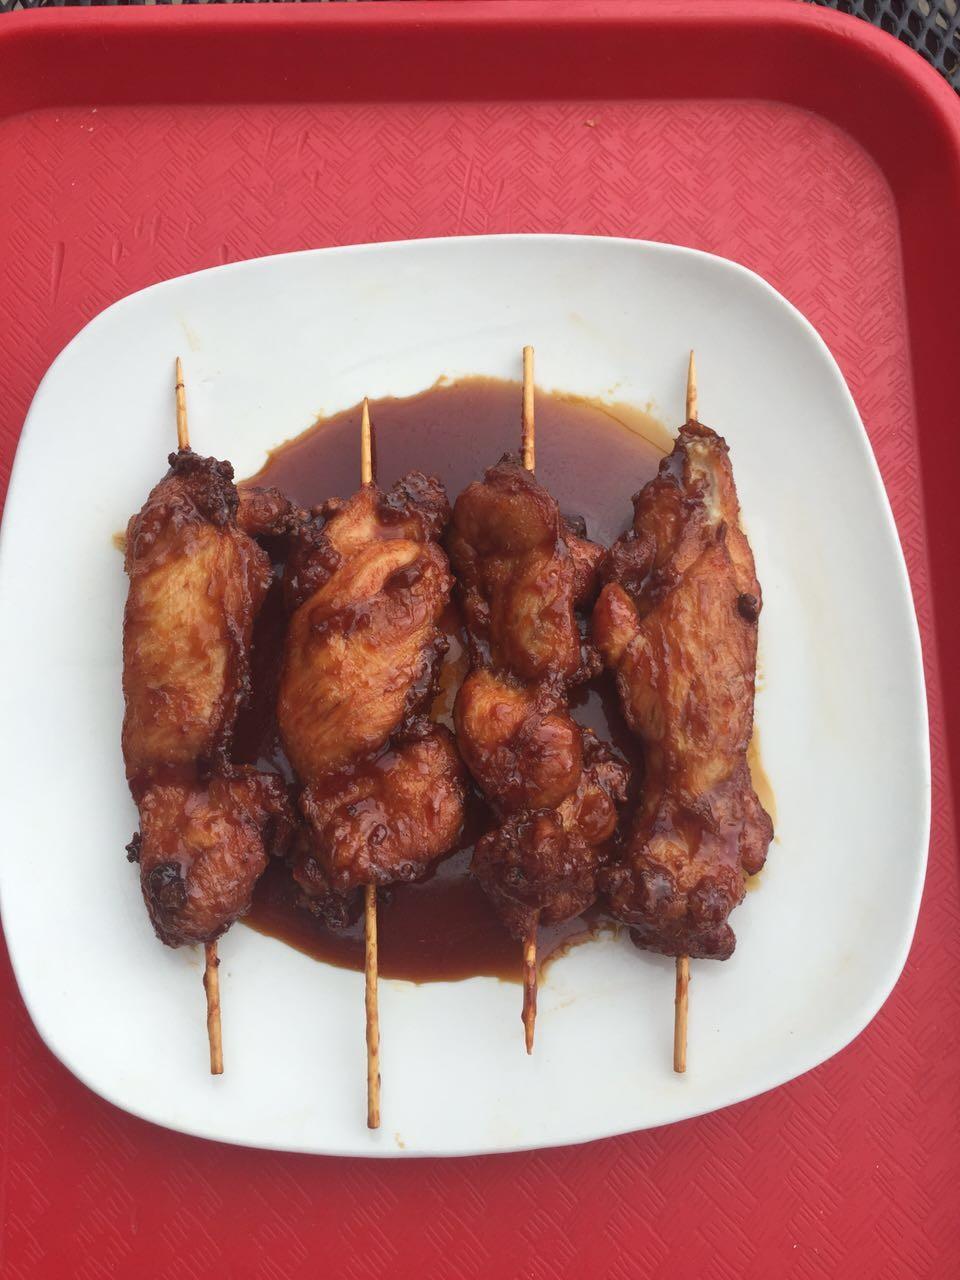 S4. Chicken Skewer (4) 鸡串 Image